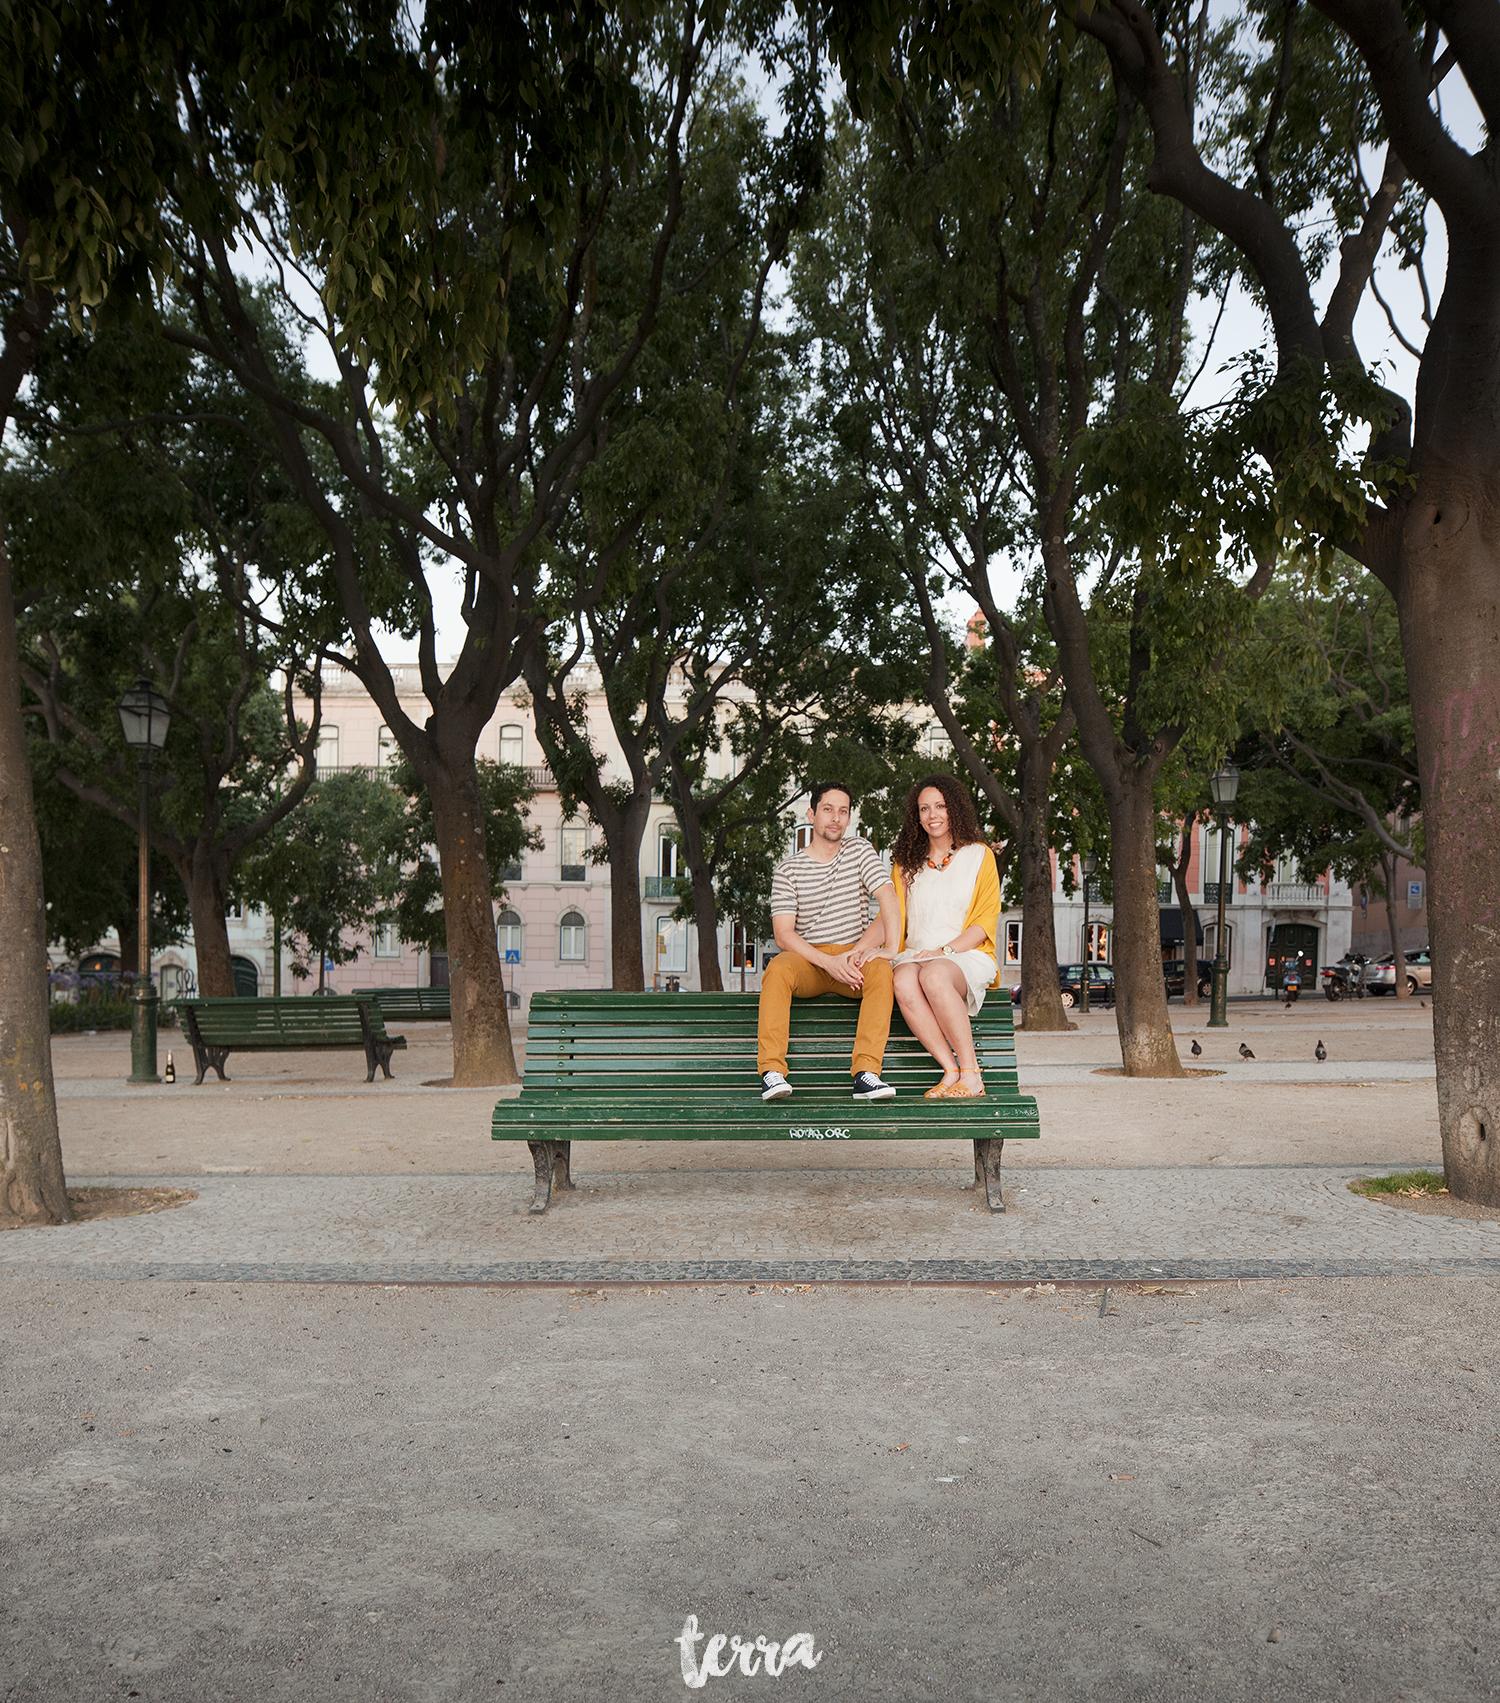 sessao-fotografica-casal-bairro-alto-lisboa-terra-fotografia-0003.jpg